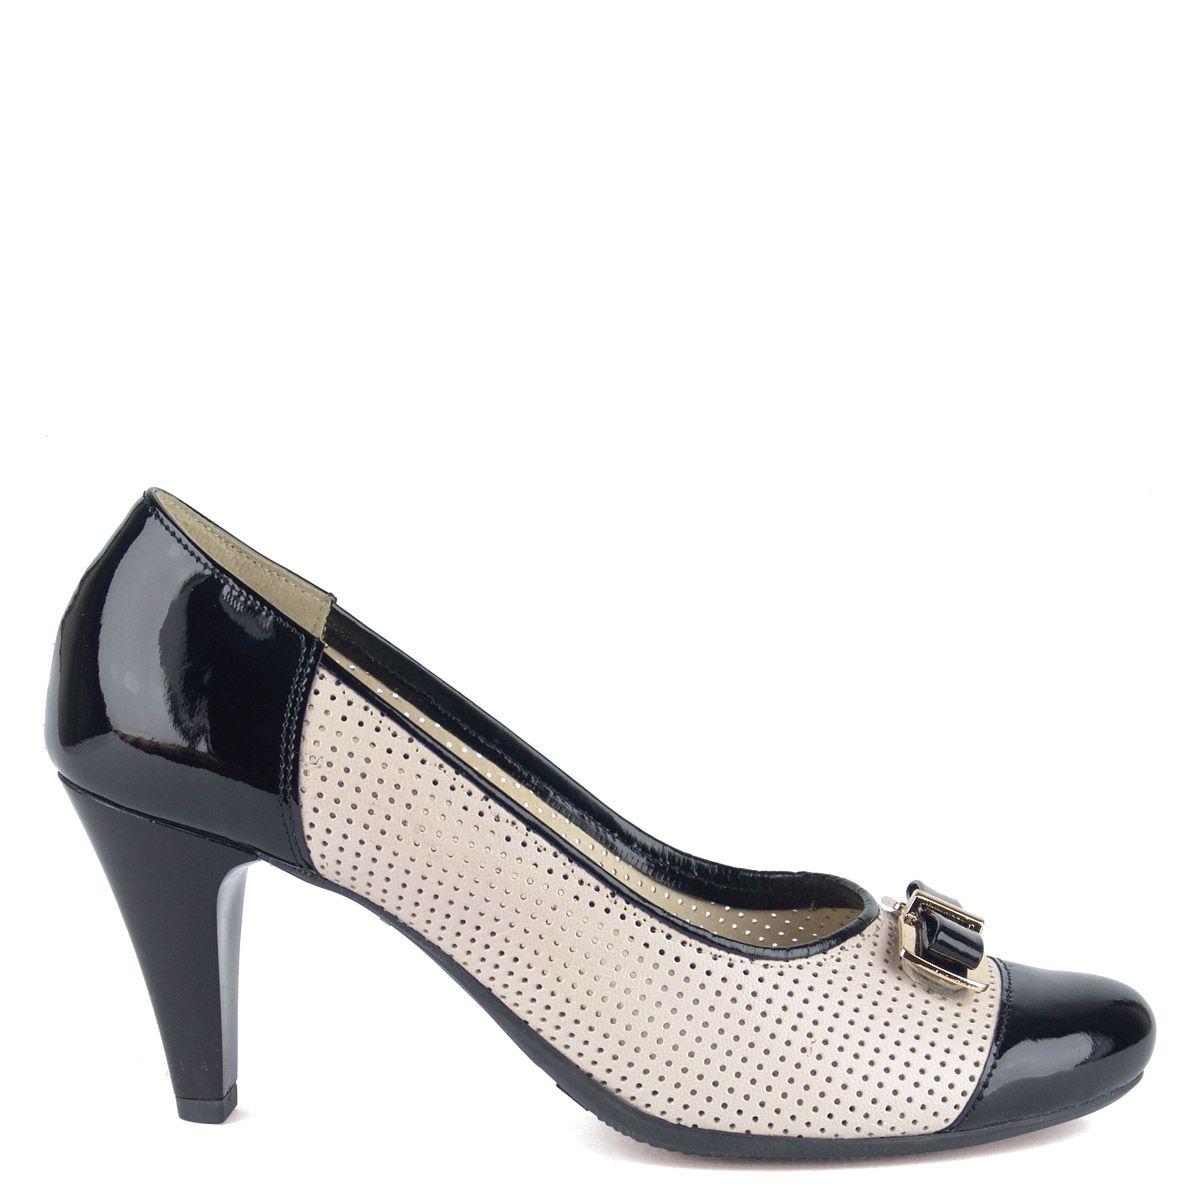 dfb7e4f838ba Kittens, Kitten Heels, Peeps, Peep Toe, Shoes, Fashion, Moda,